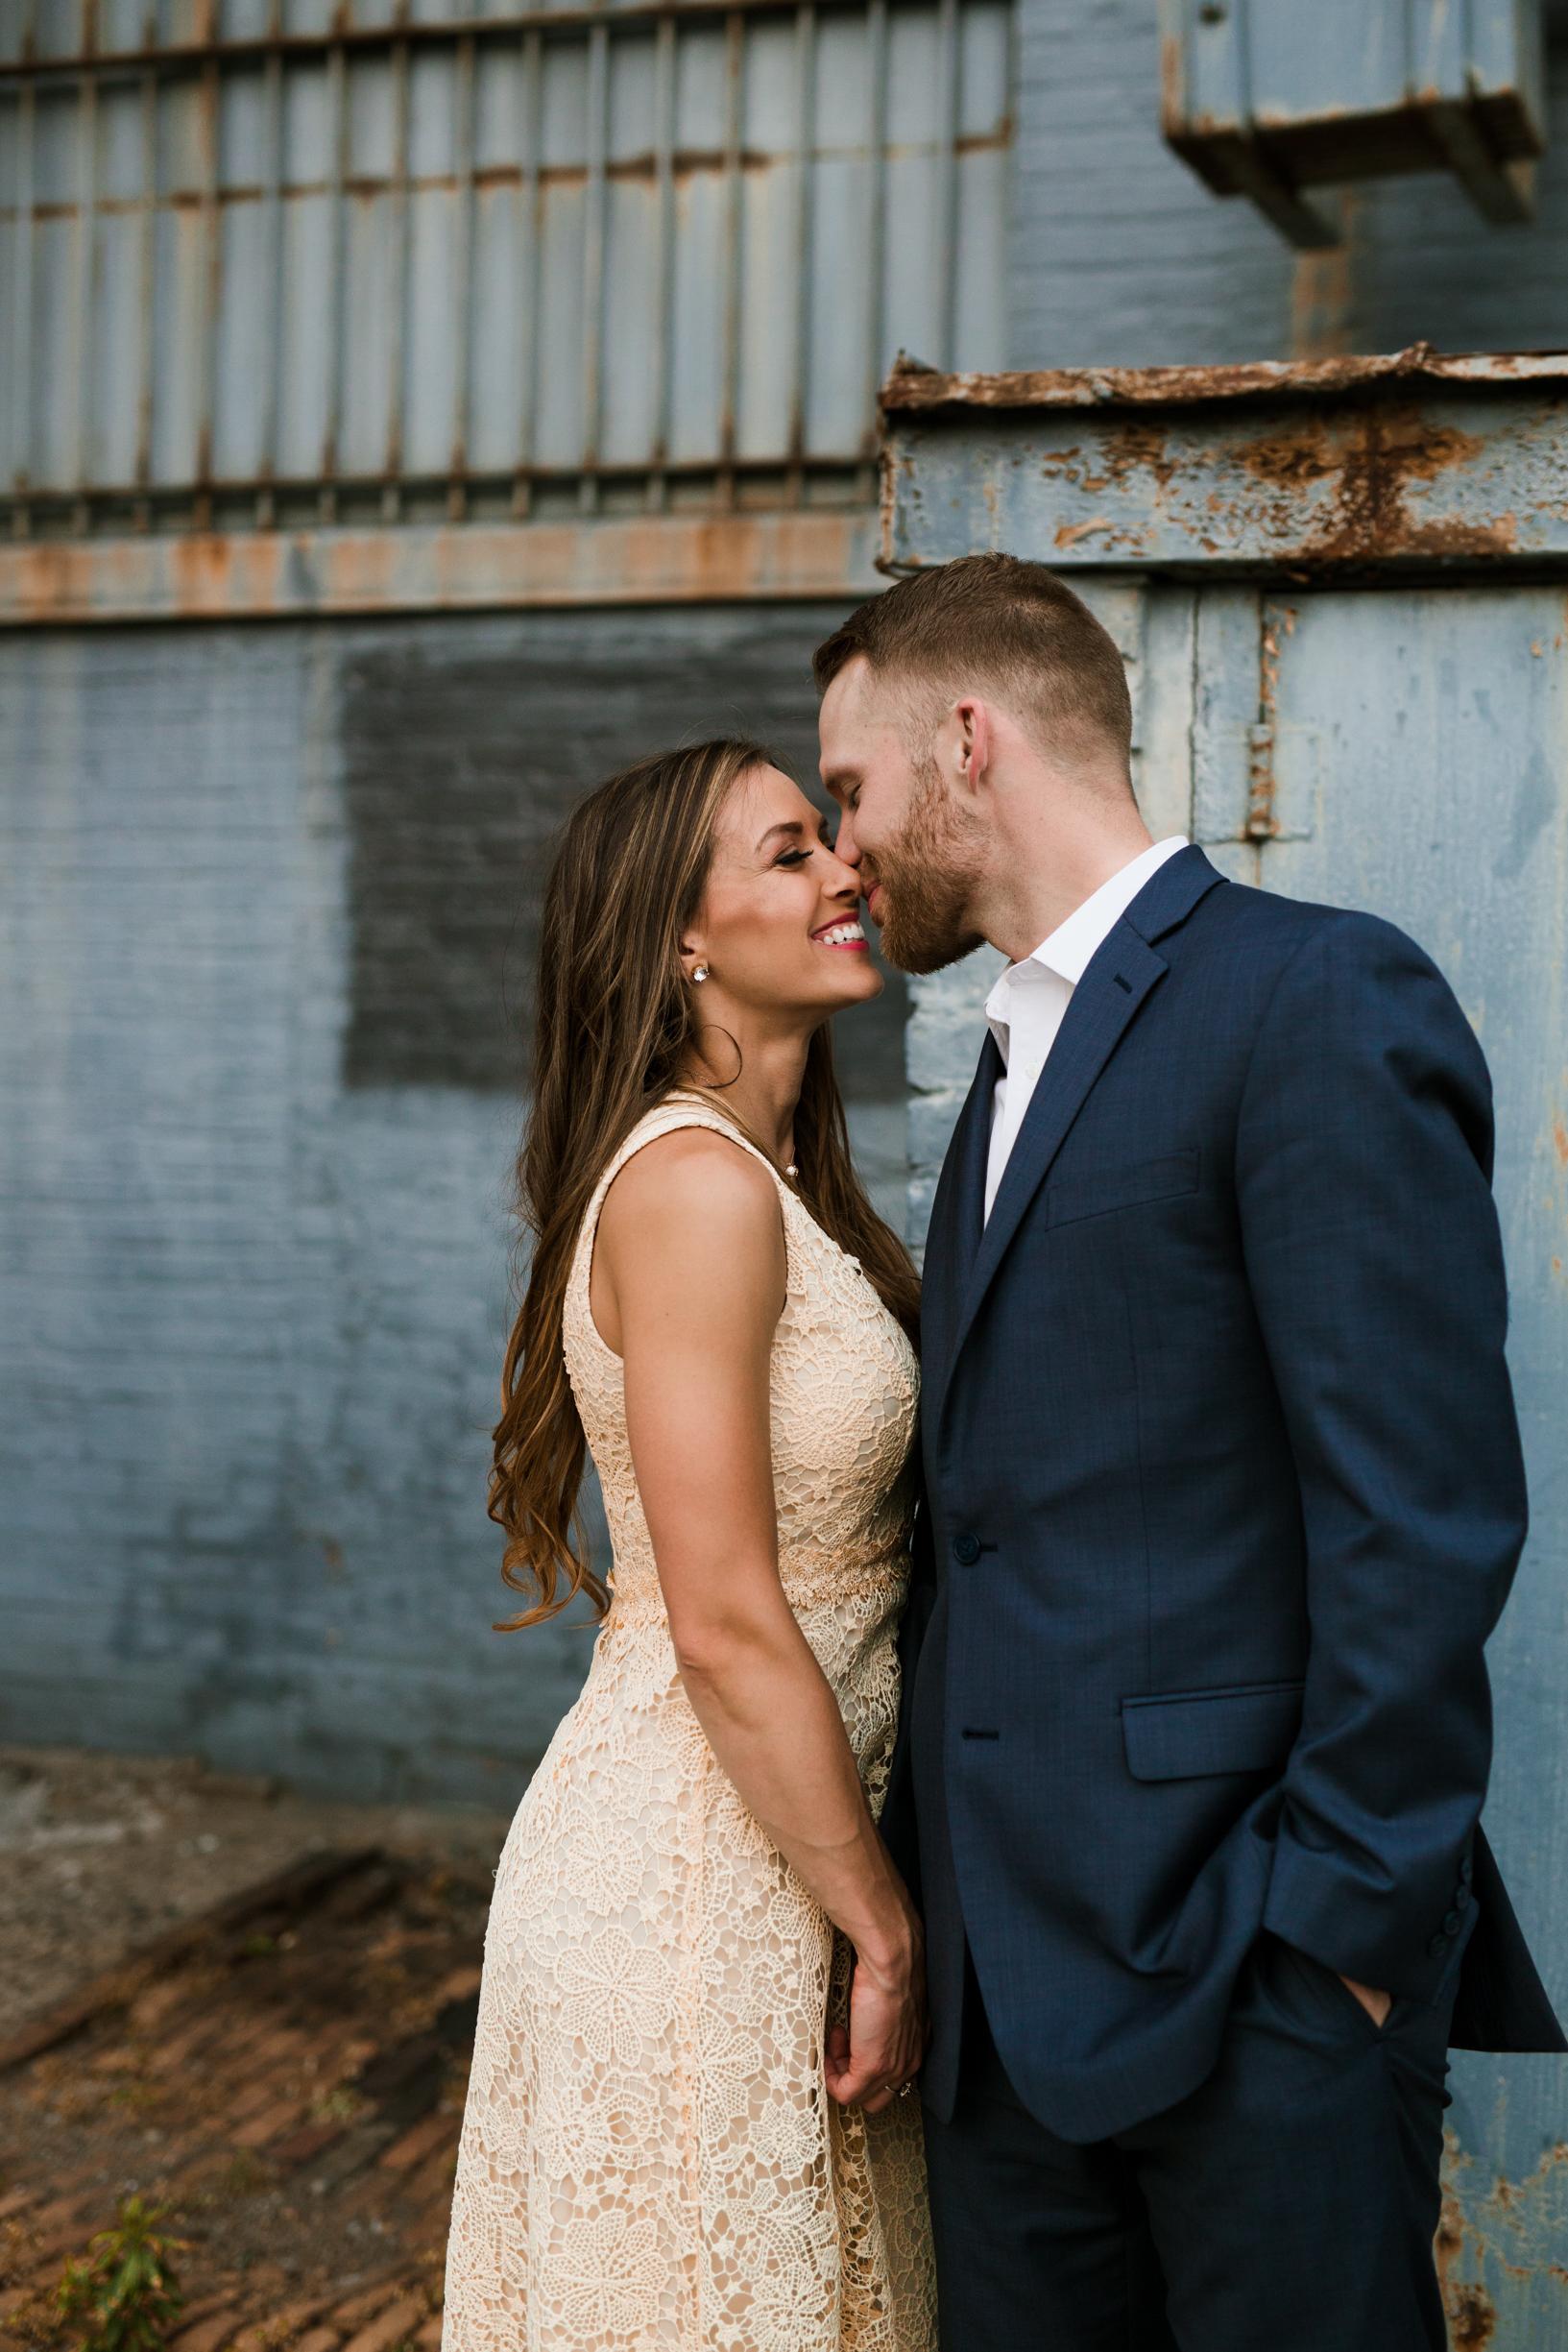 Victoria & Chad Engagement 2018 Crystal Ludwick Photo Louisville Kentucky Wedding Photographer WEBSITE (38 of 48).jpg